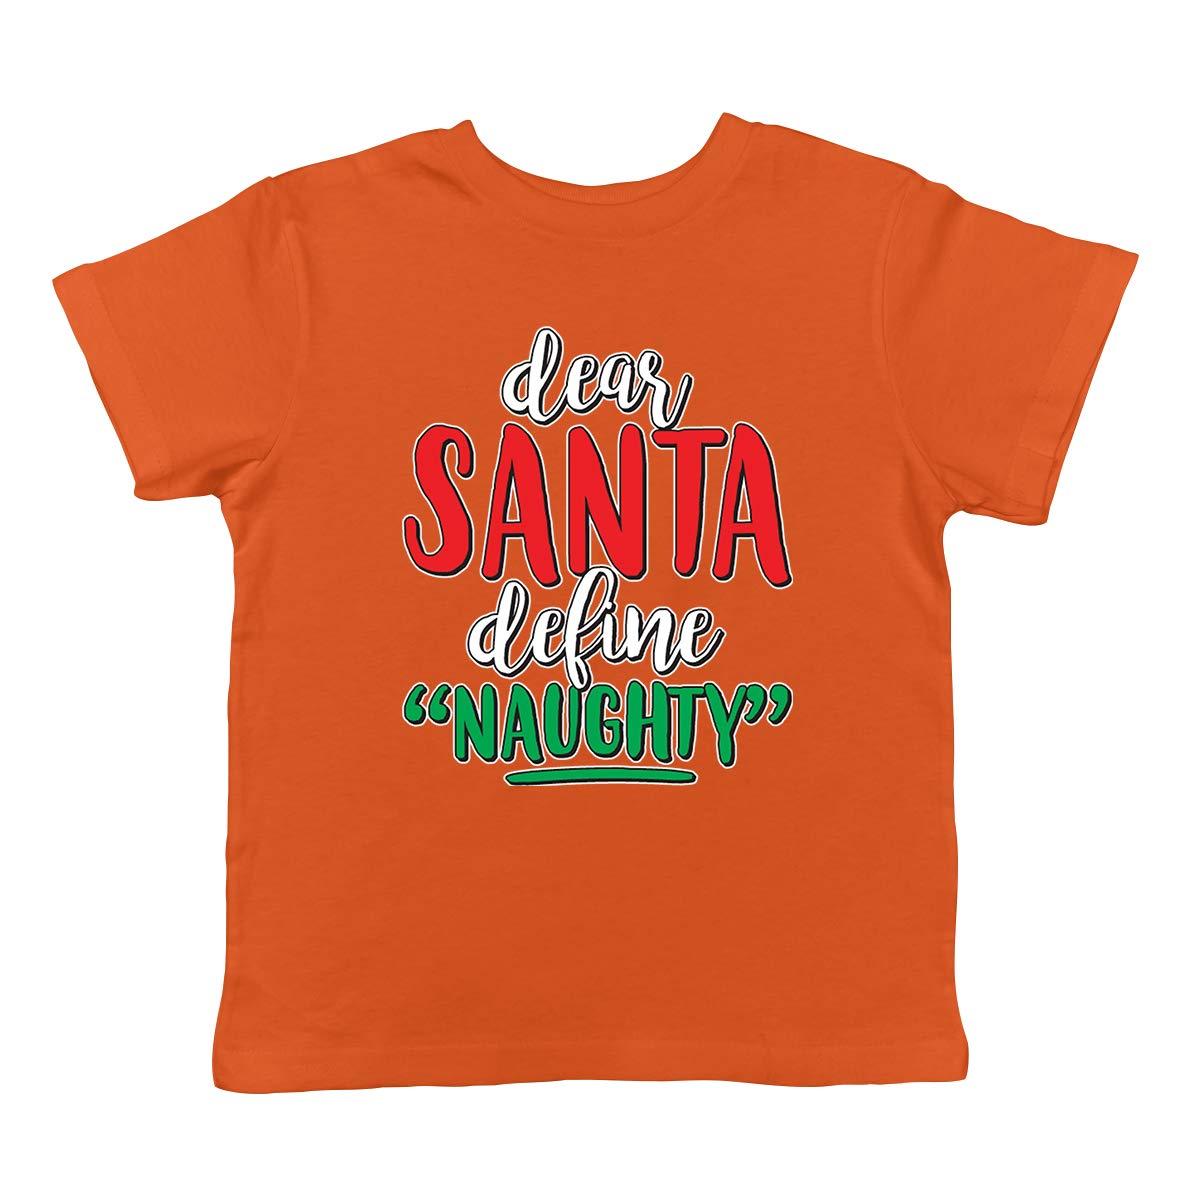 Define Naughty Infant T-Shirt SpiritForged Apparel Dear Santa